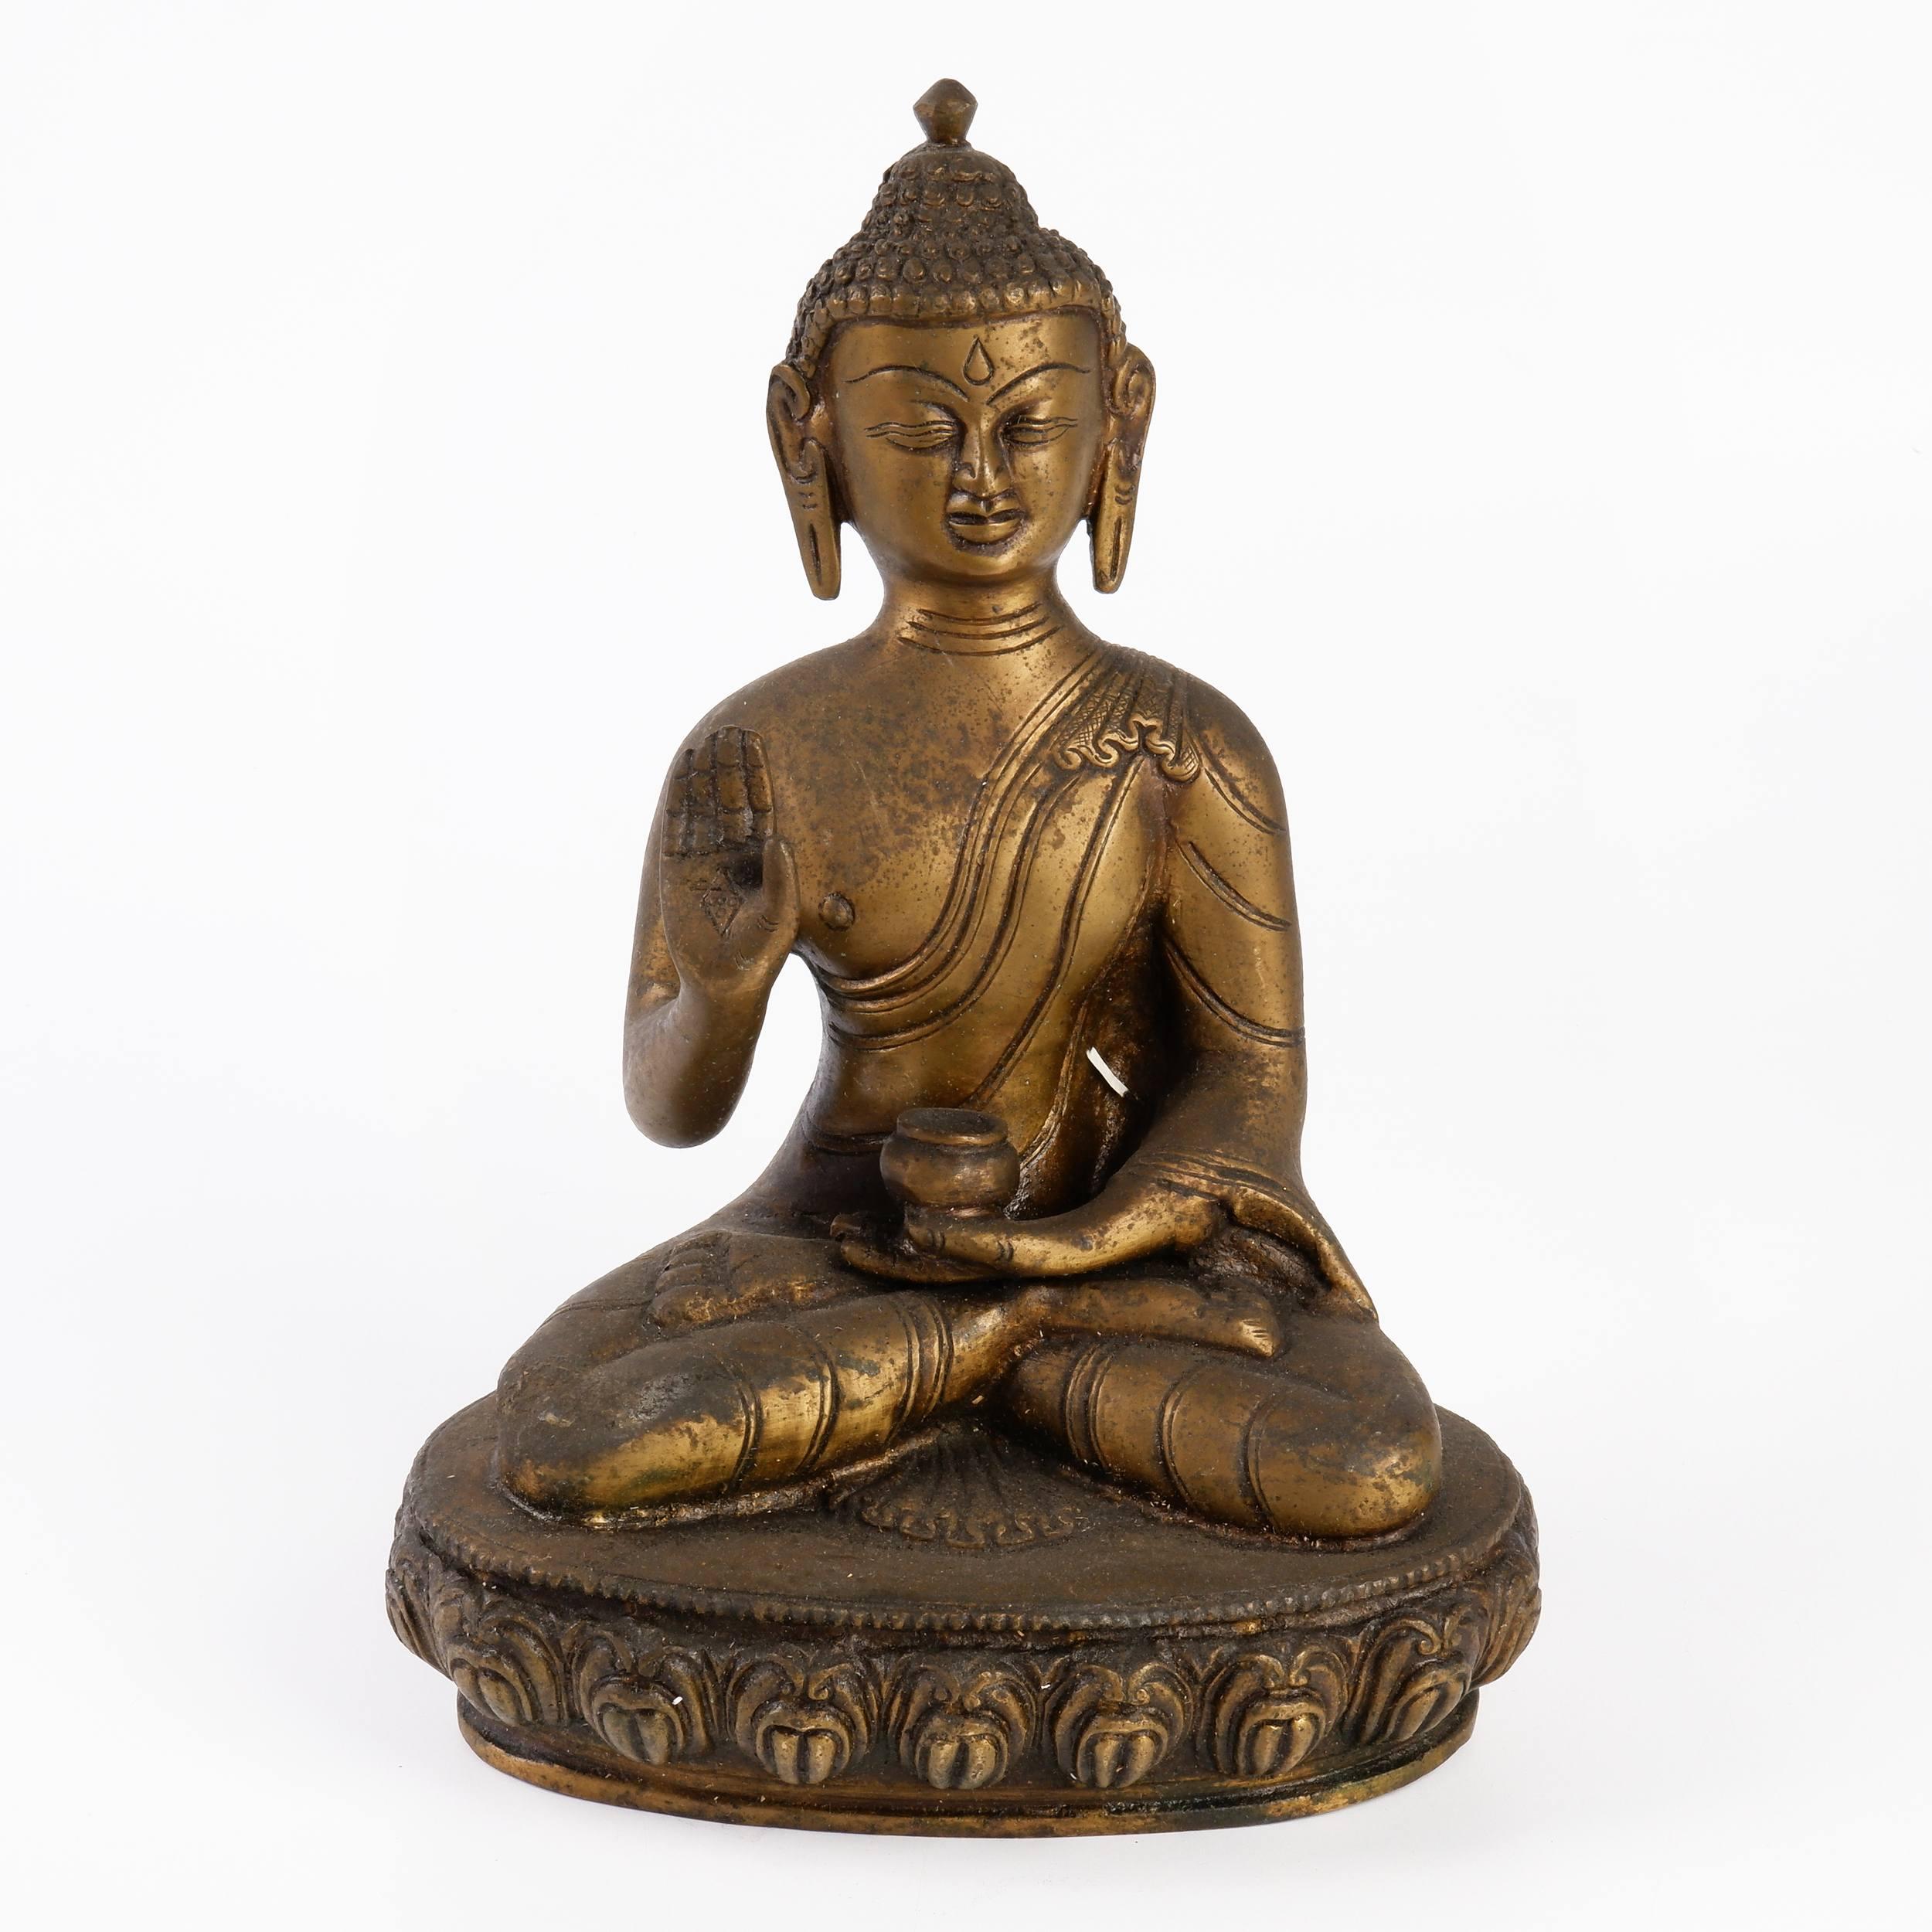 'Cast Bronze Figure of Buddha Shakyamuni with Alms Bowl and Third Eye Seated on a Lotus Base'